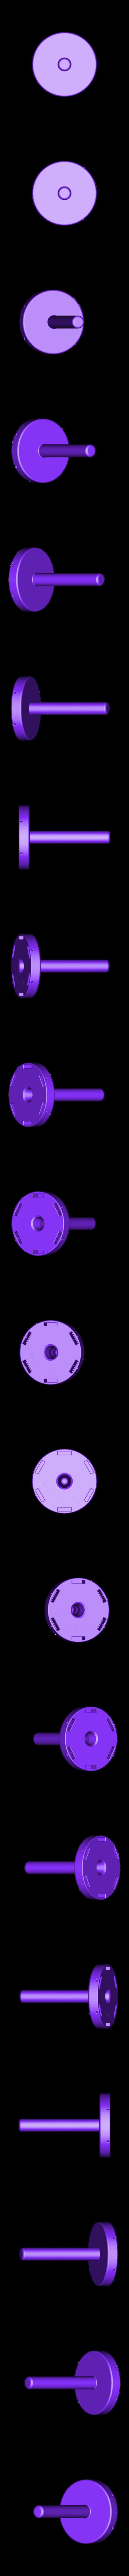 Spool_spindle.stl Télécharger fichier STL gratuit Universal stand-alone filament spool holder (Fully 3D-printable) • Objet pour impression 3D, CreativeTools